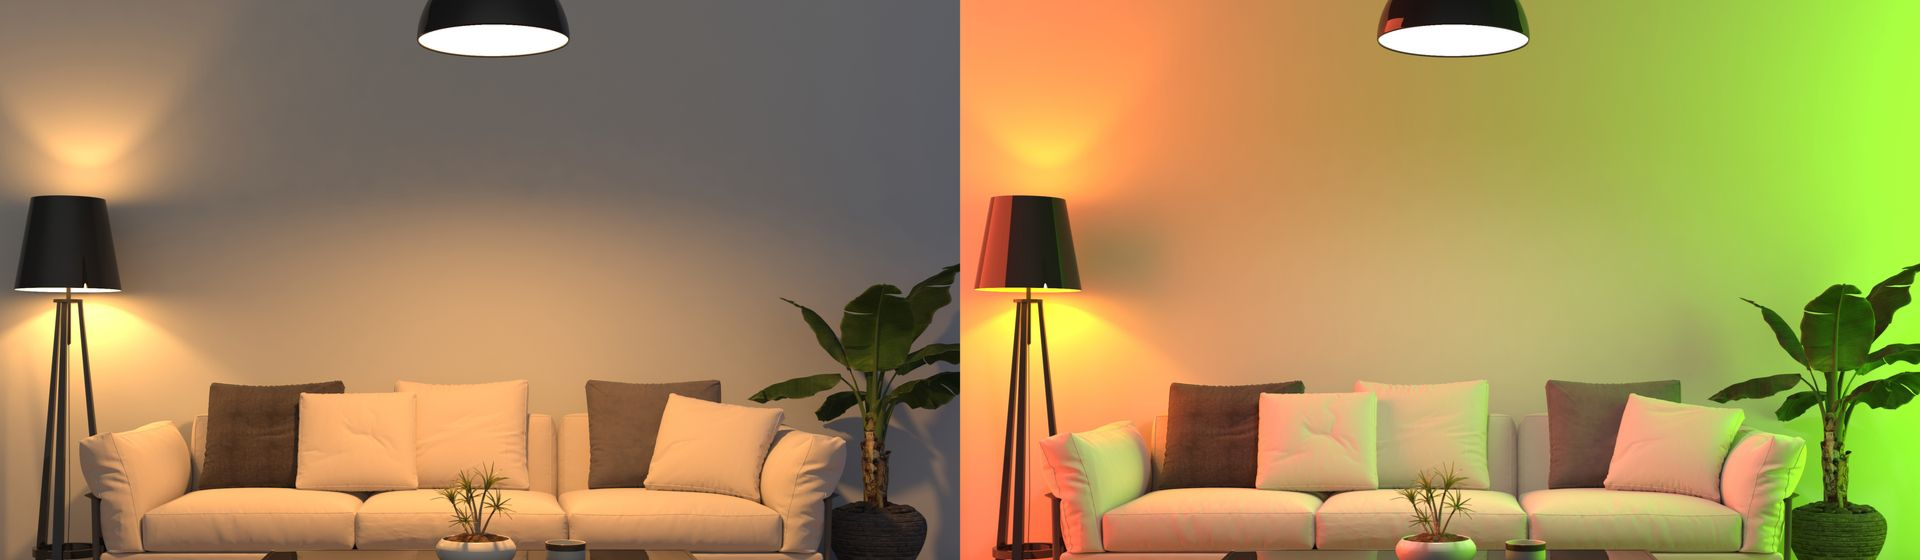 Lâmpada inteligente: veja 5 opções disponíveis no Brasil